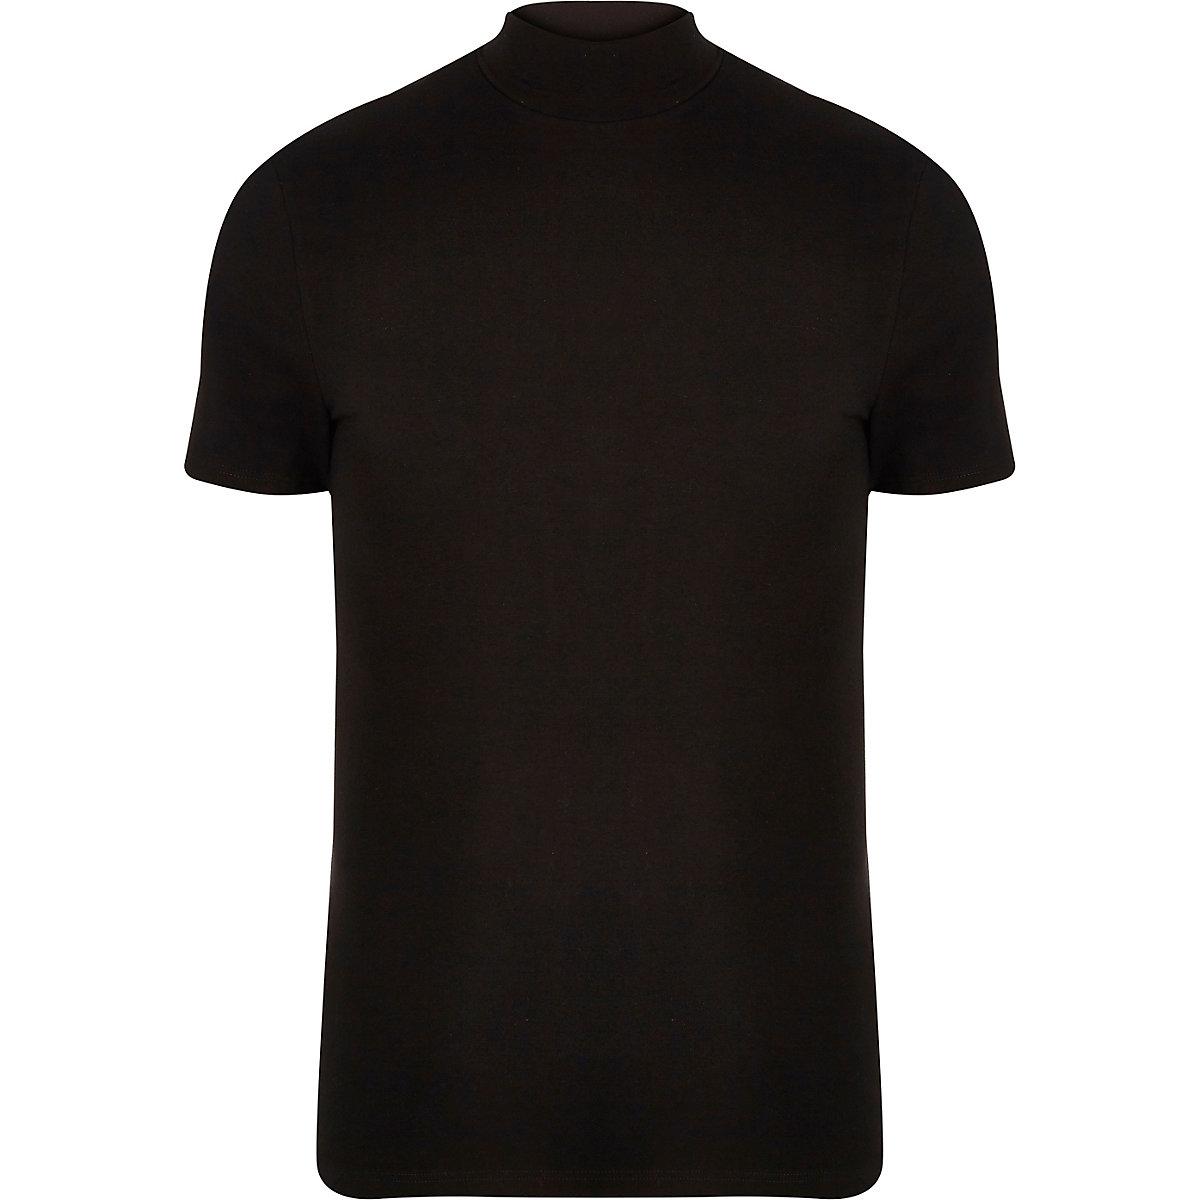 Black muscle fit turtle neck T-shirt